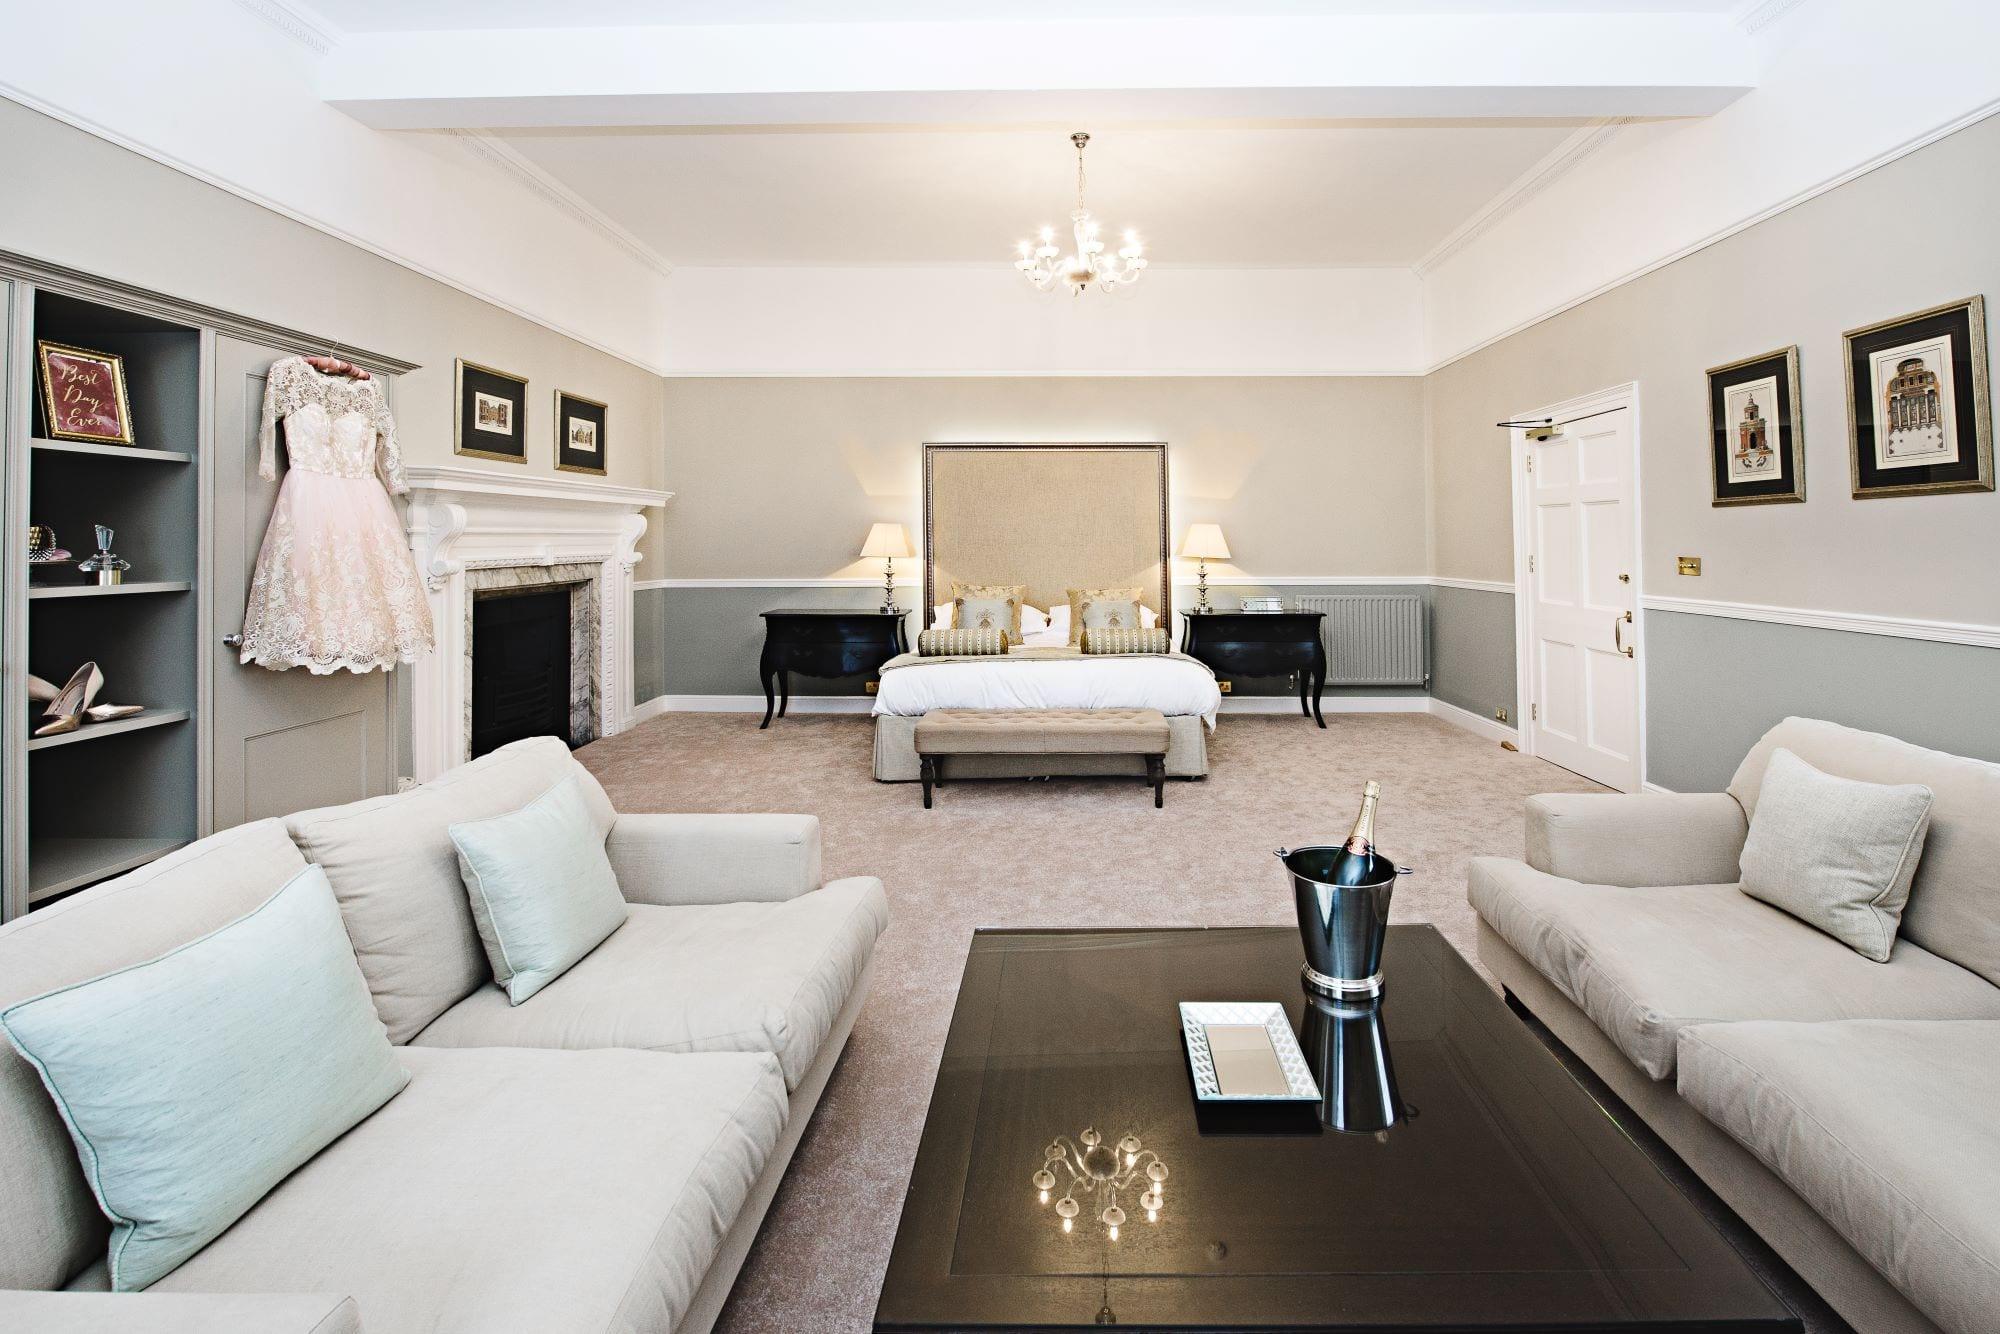 Luxurious wedding night bedroom at Farnham Castle in Surrey